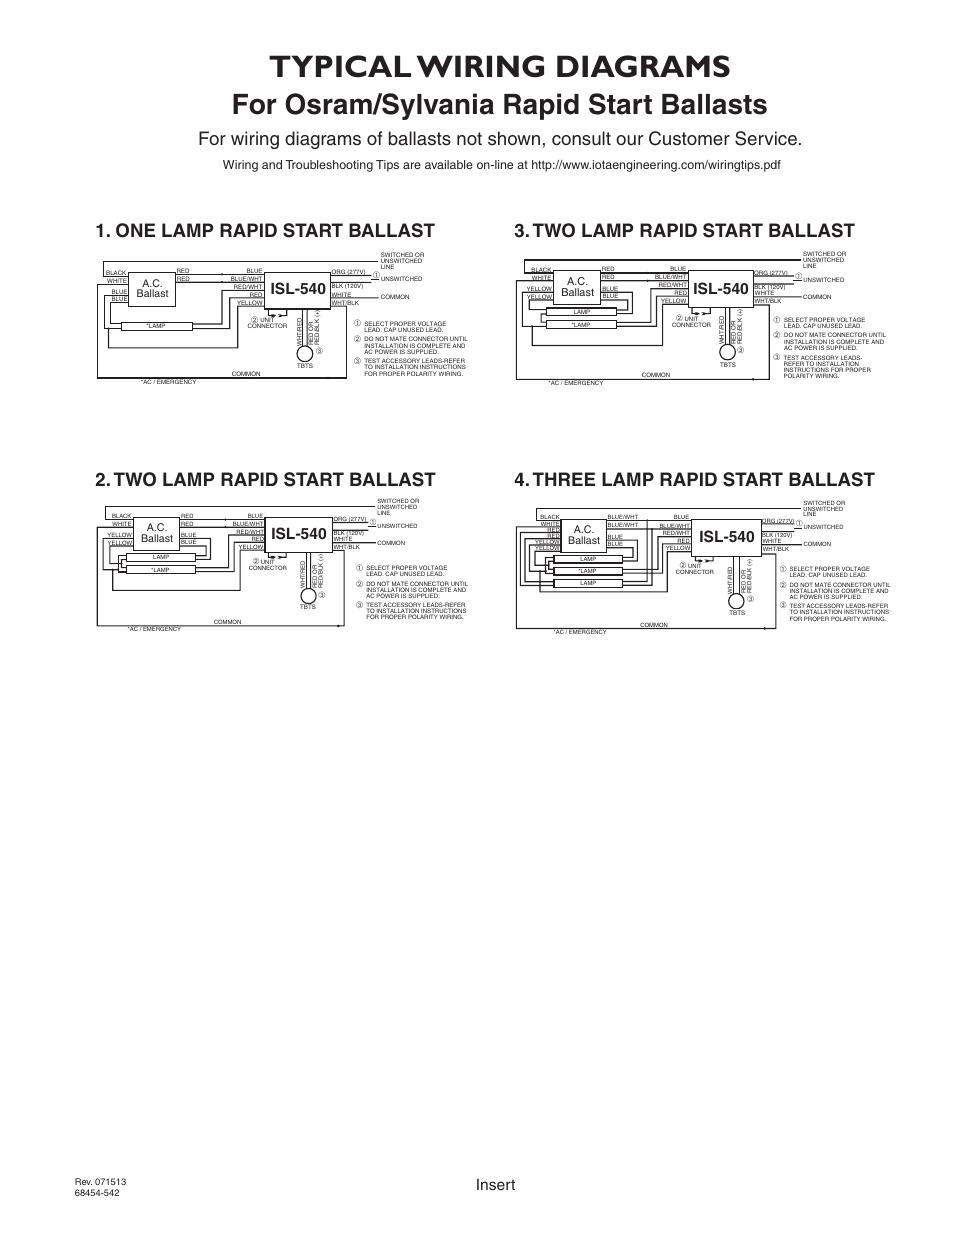 medium resolution of typical wiring diagrams for osram sylvania rapid start ballasts isl 540 ballast wiring diagram